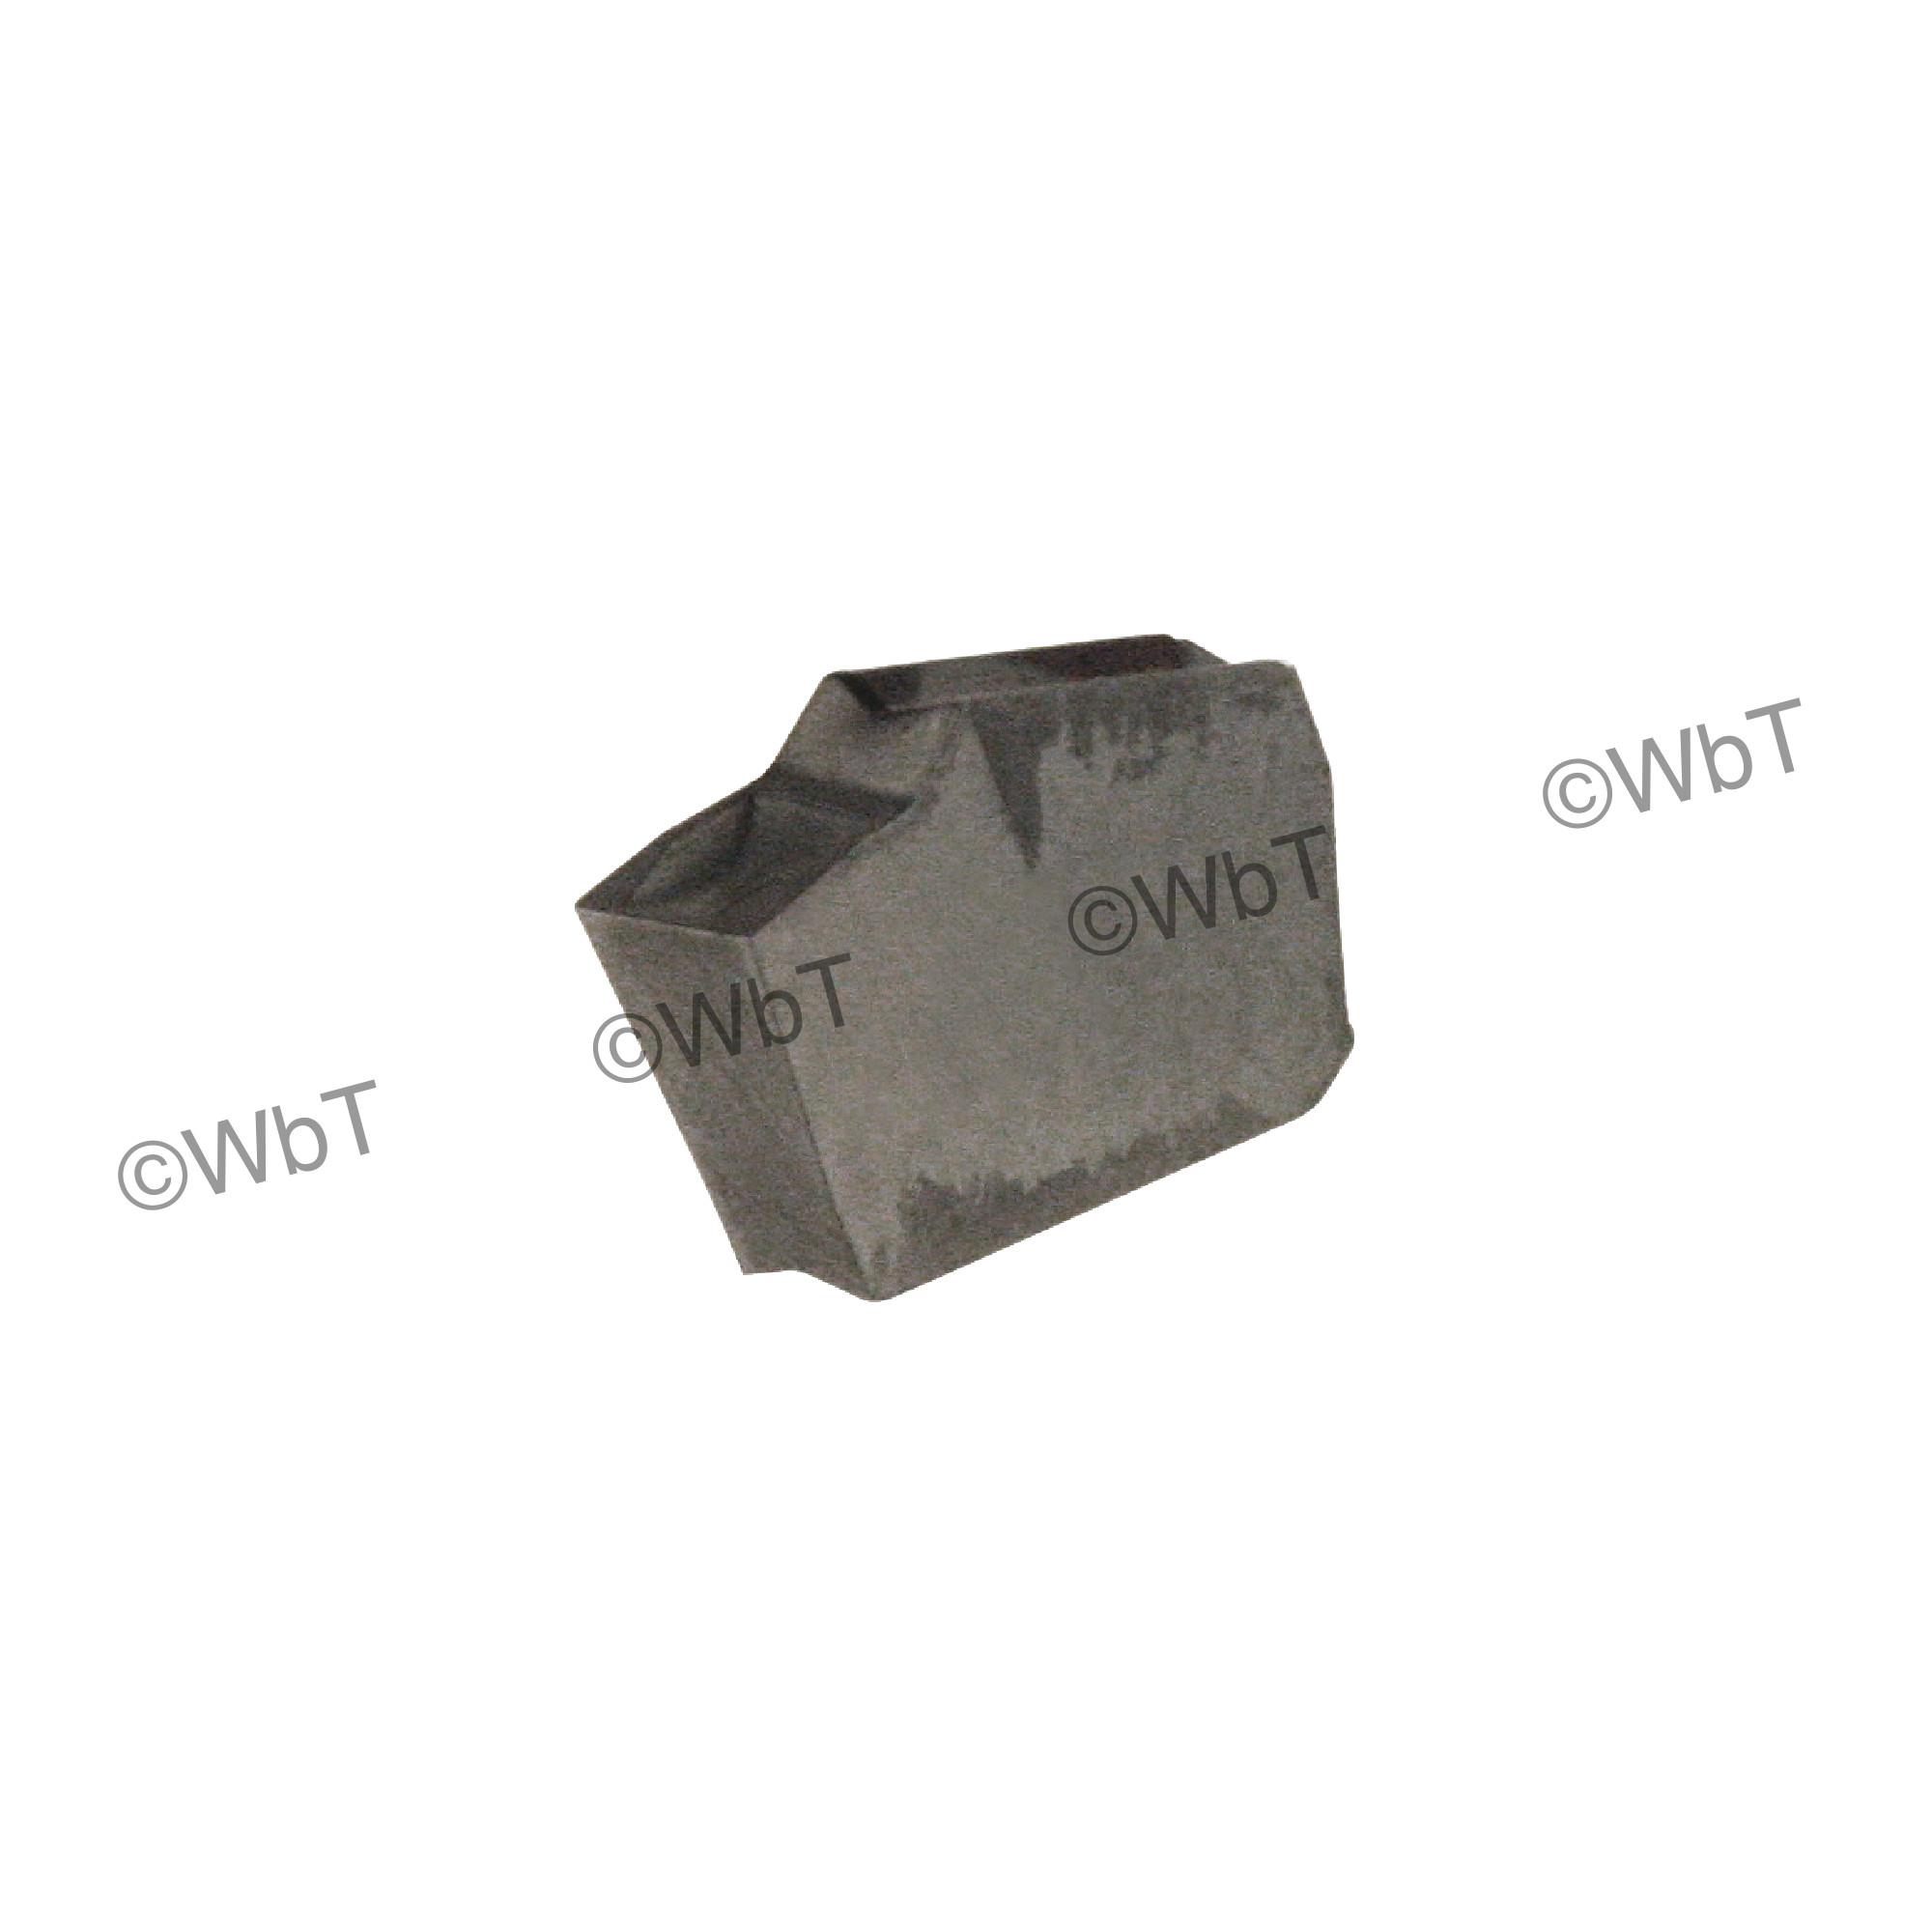 "ISCAR - GTN-3 IC20 / GTN - SELF-GRIP Indexable Carbide Insert / 0.122"" Cutting Width"